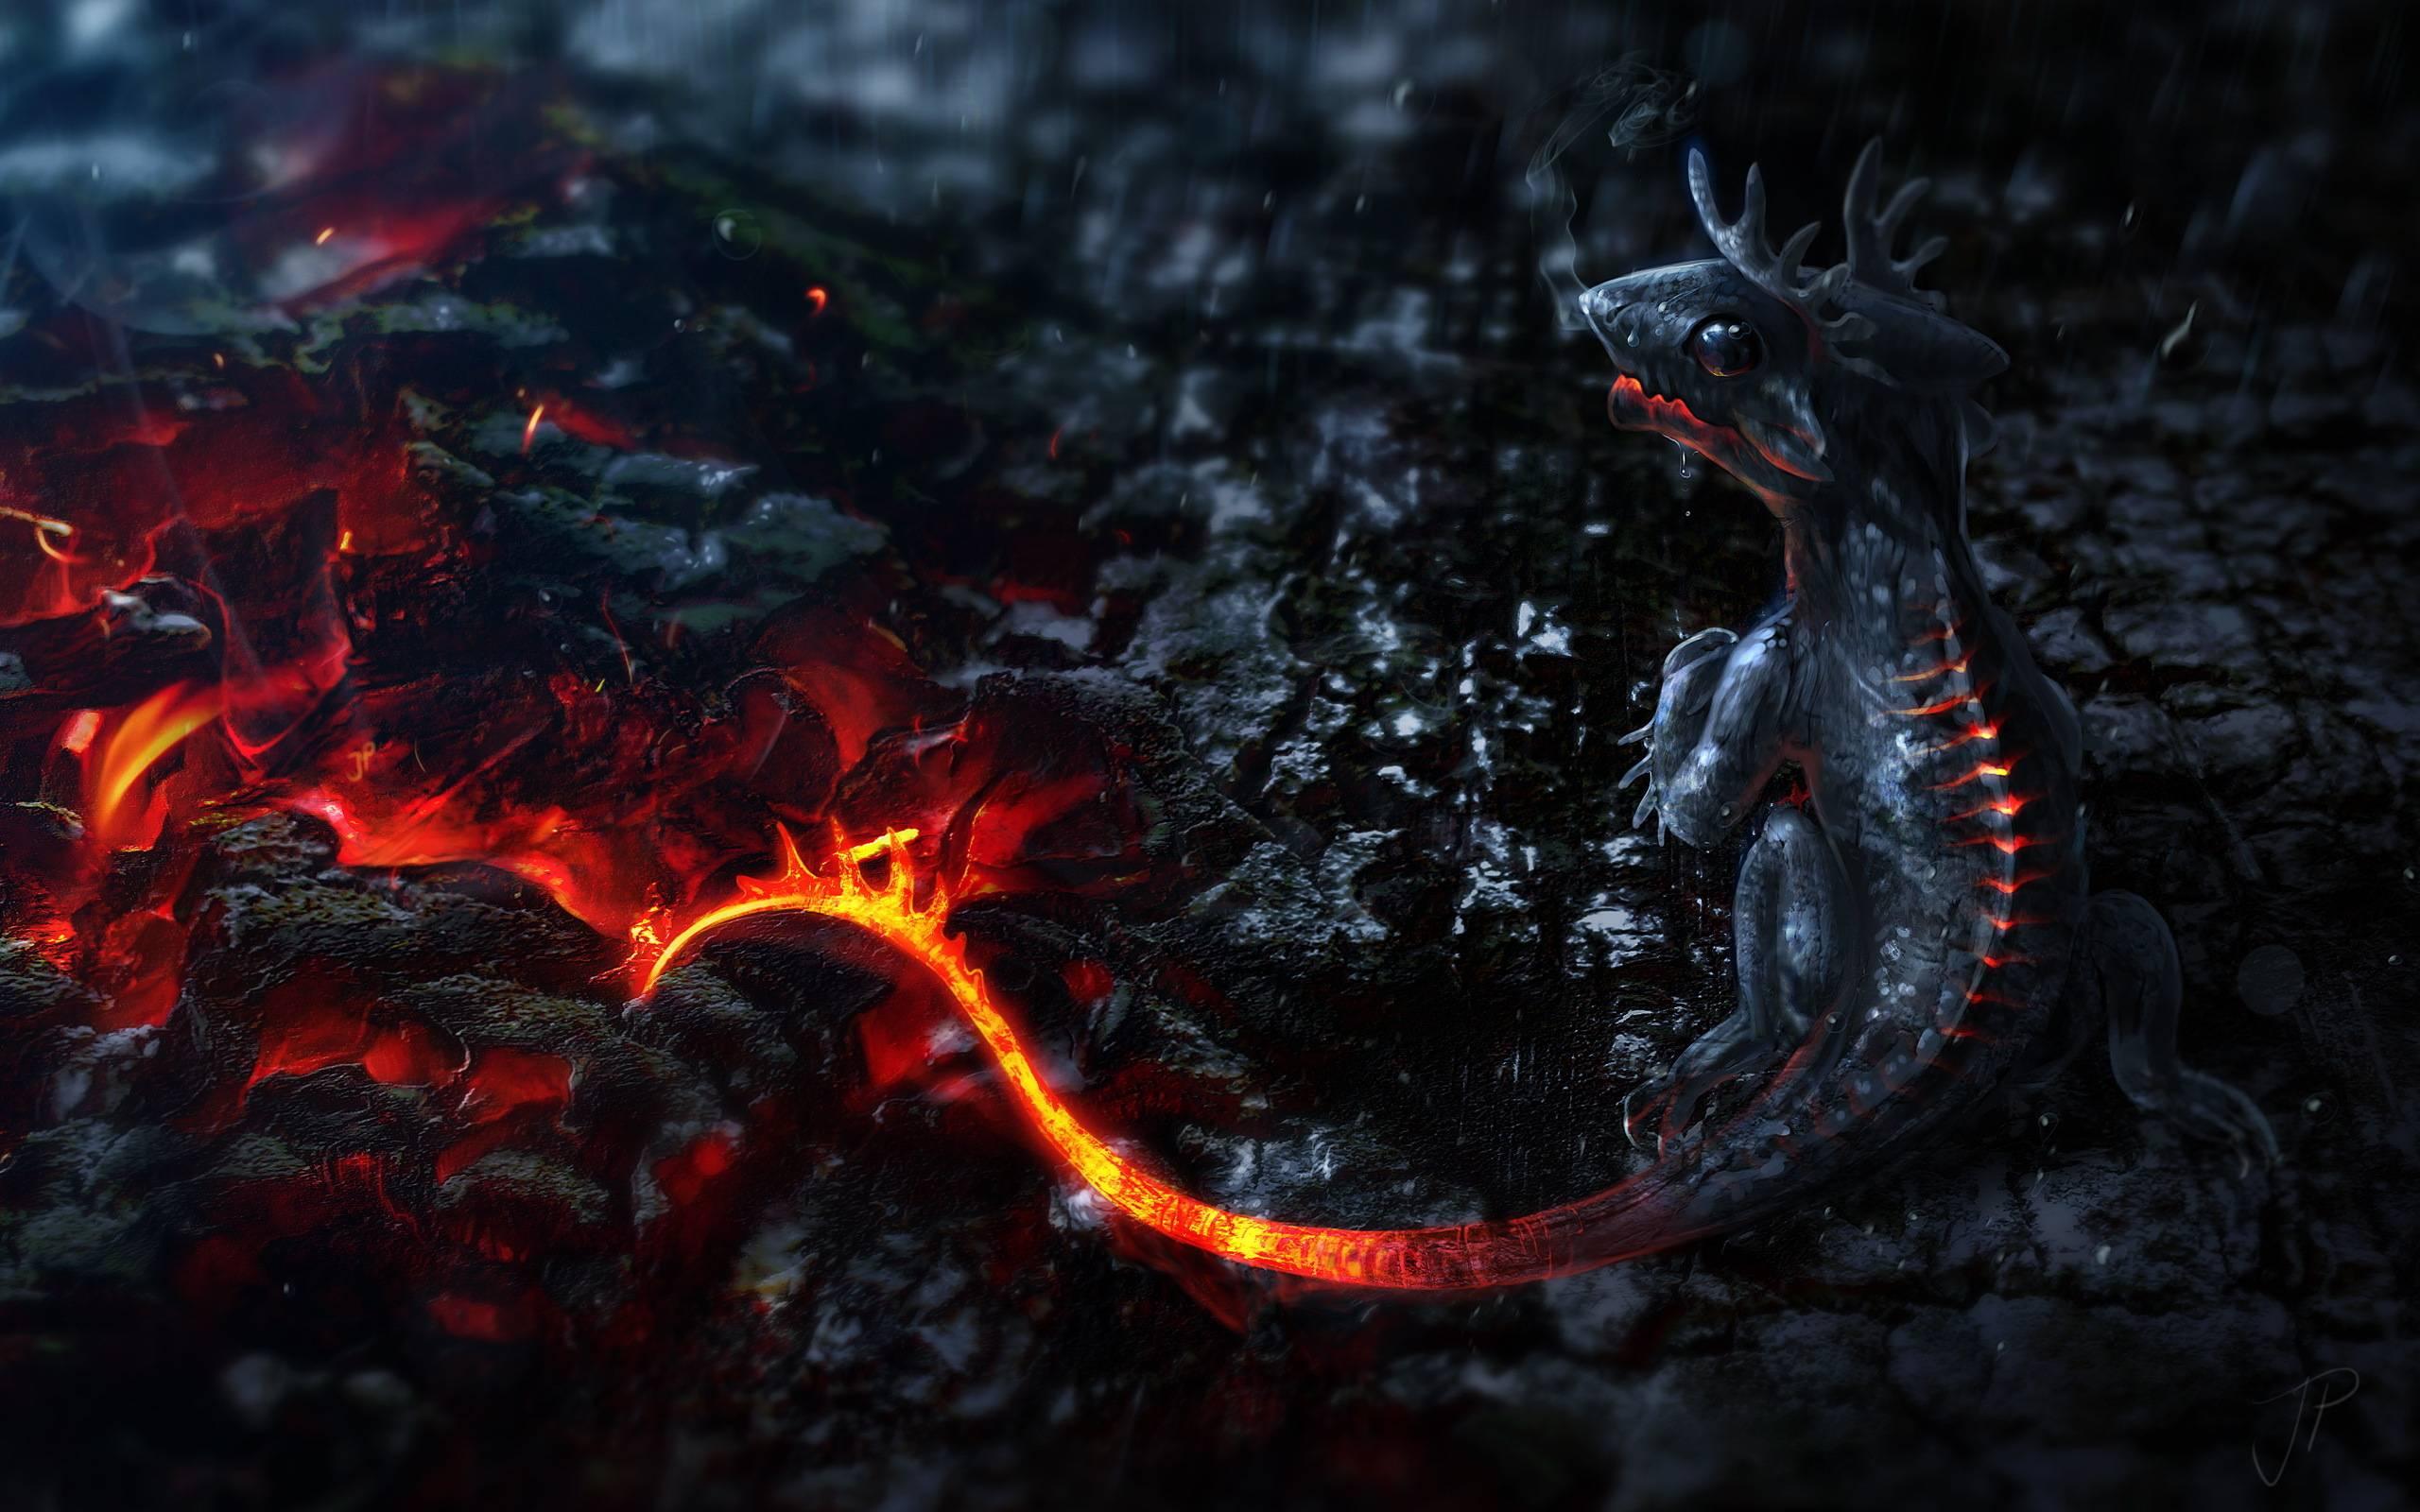 обои лава, скульптура, дракон картинки фото